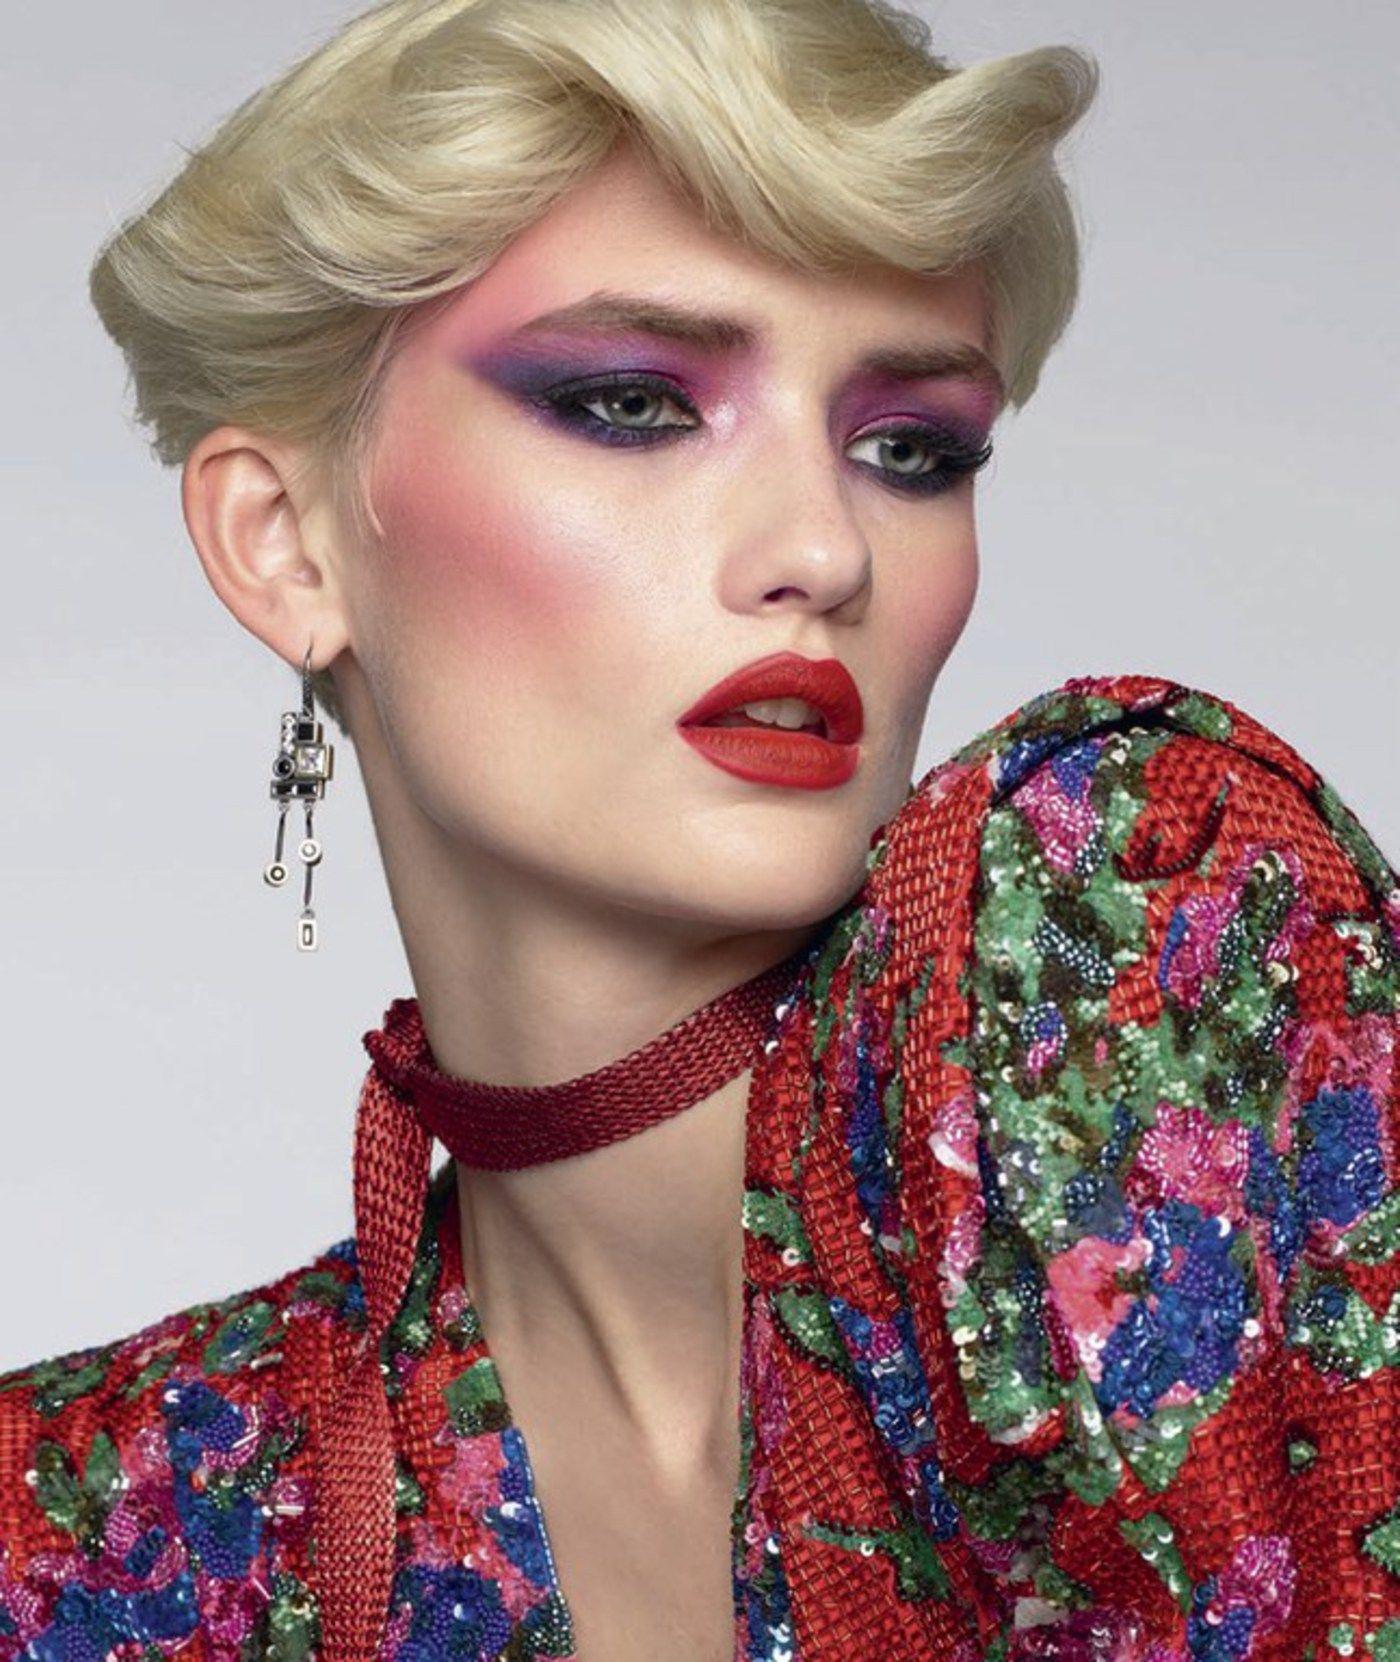 Lisa Eldridge Make Up Makeup by Makeup artist Lisa